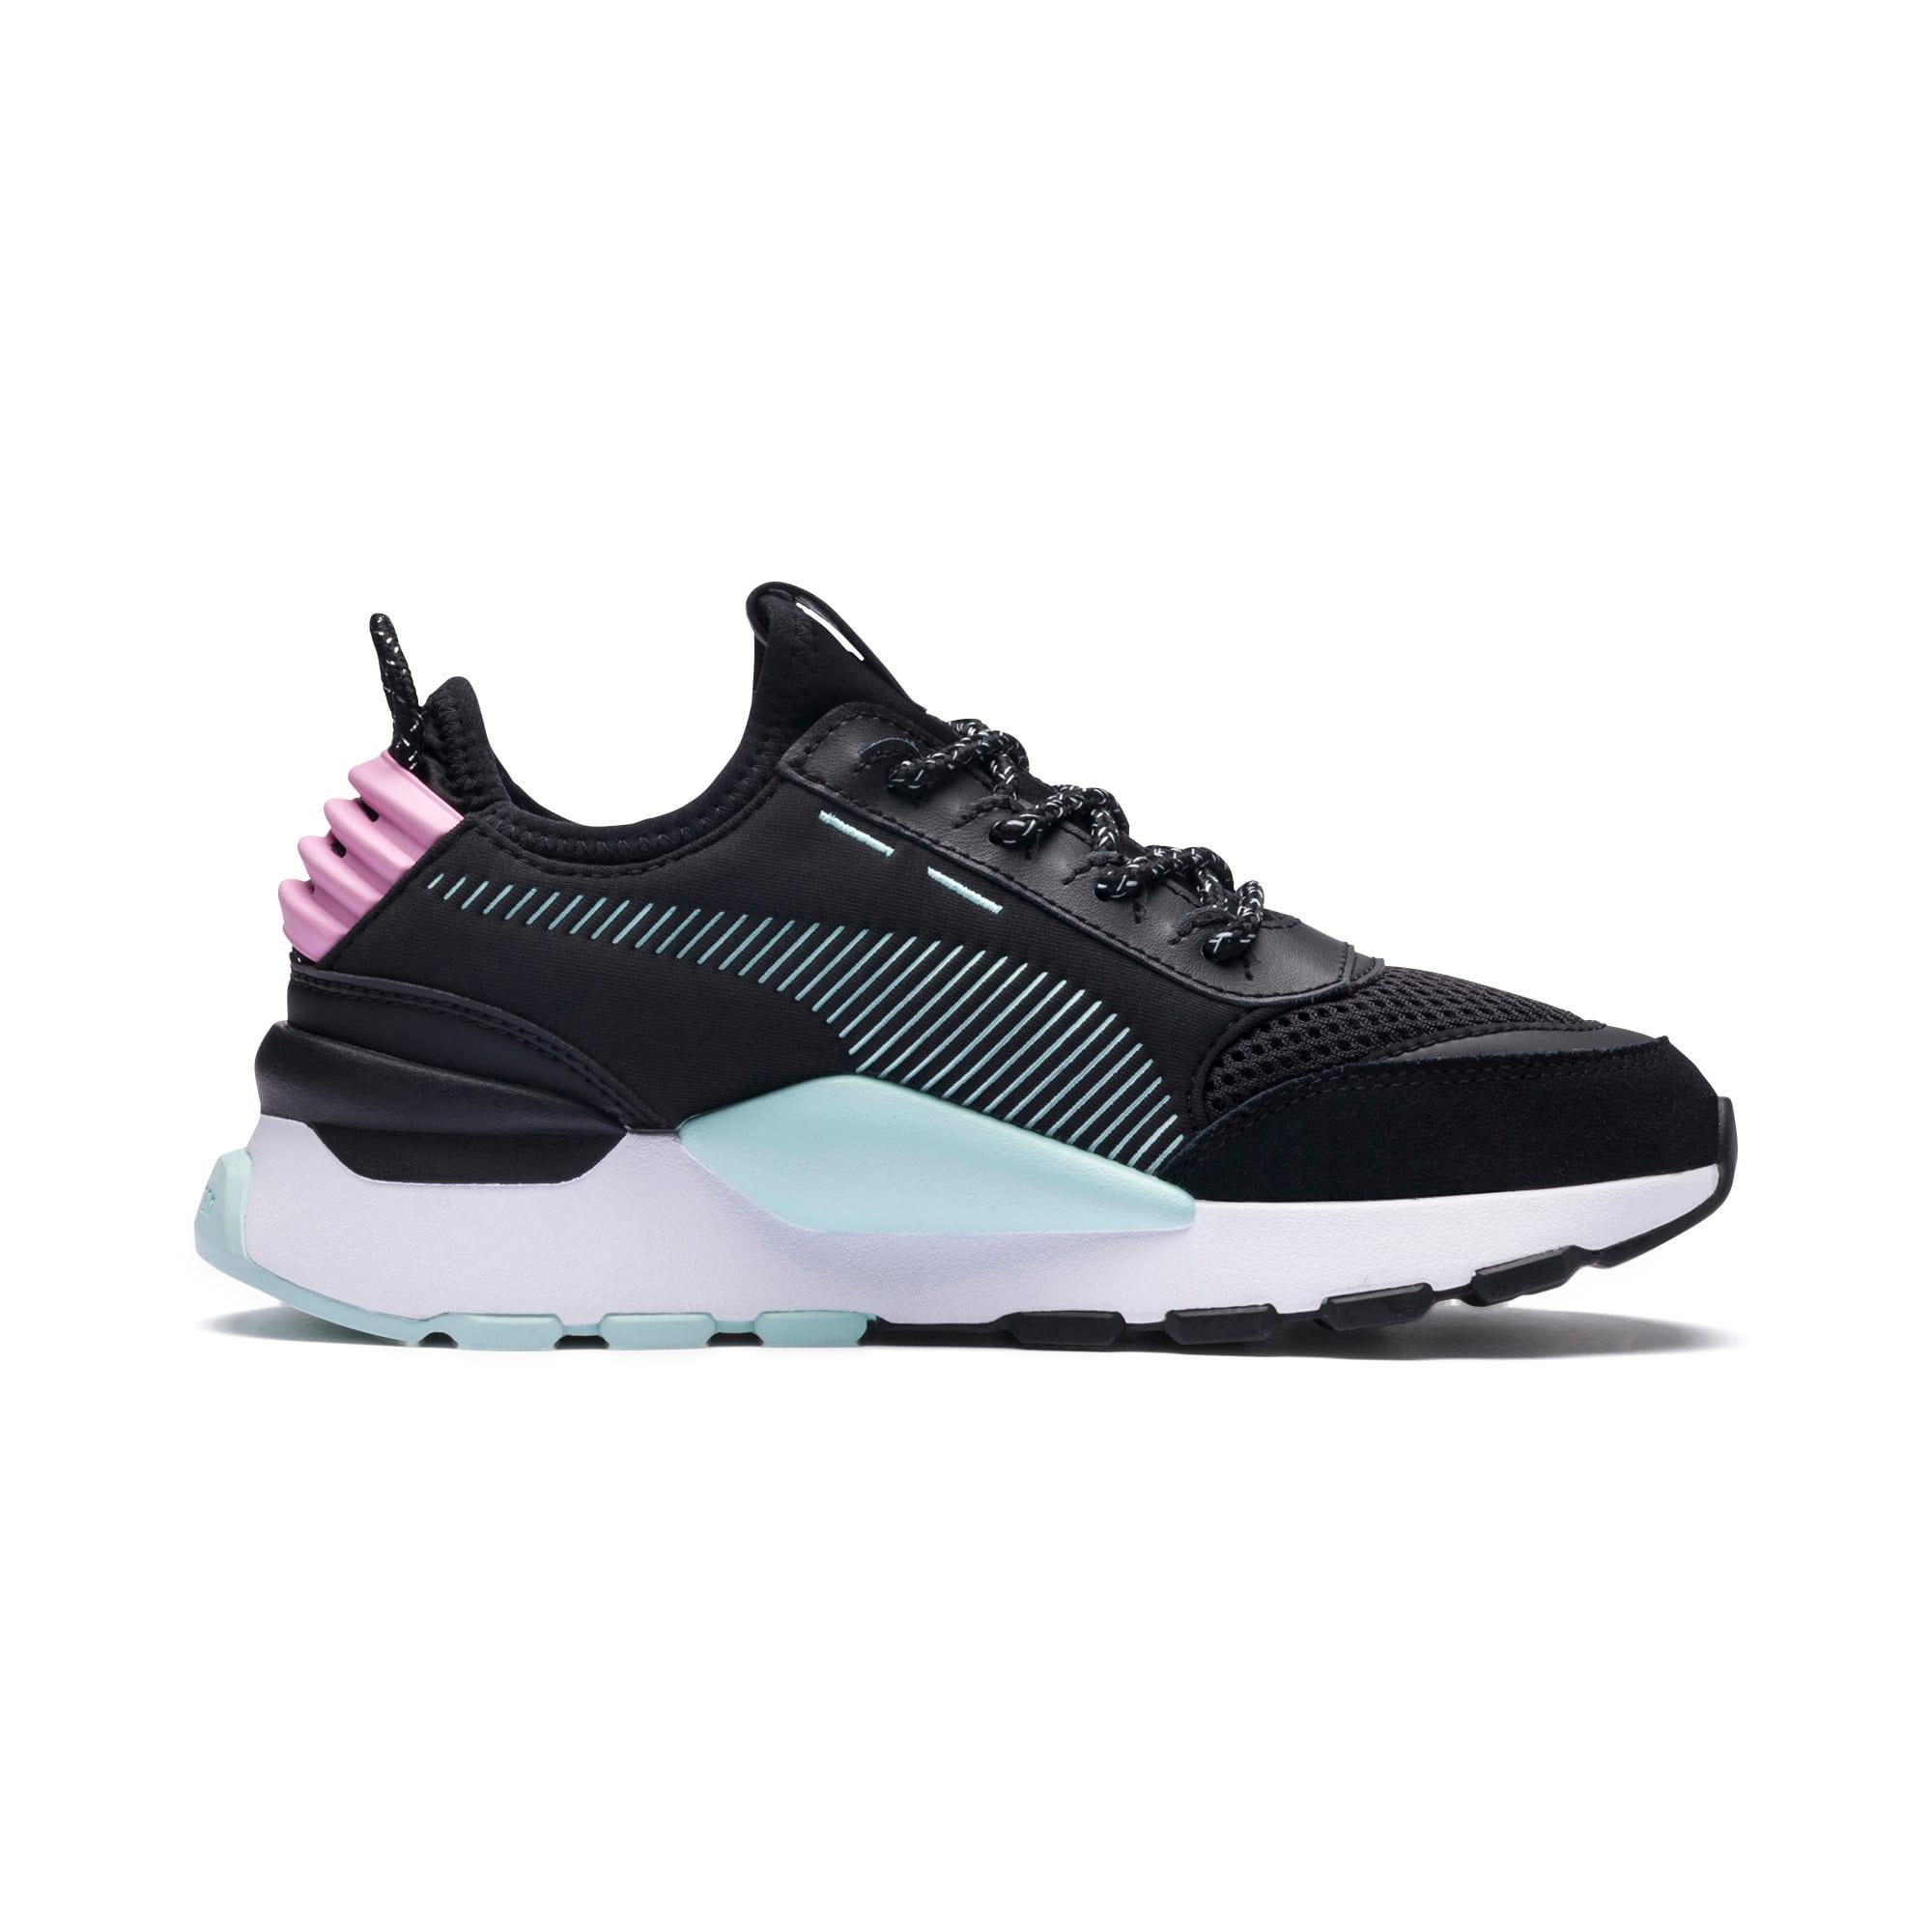 Thumbnail 5 of RS-0 Winter Inj Toys Sneakers JR, Puma Black-Pale Pink, medium